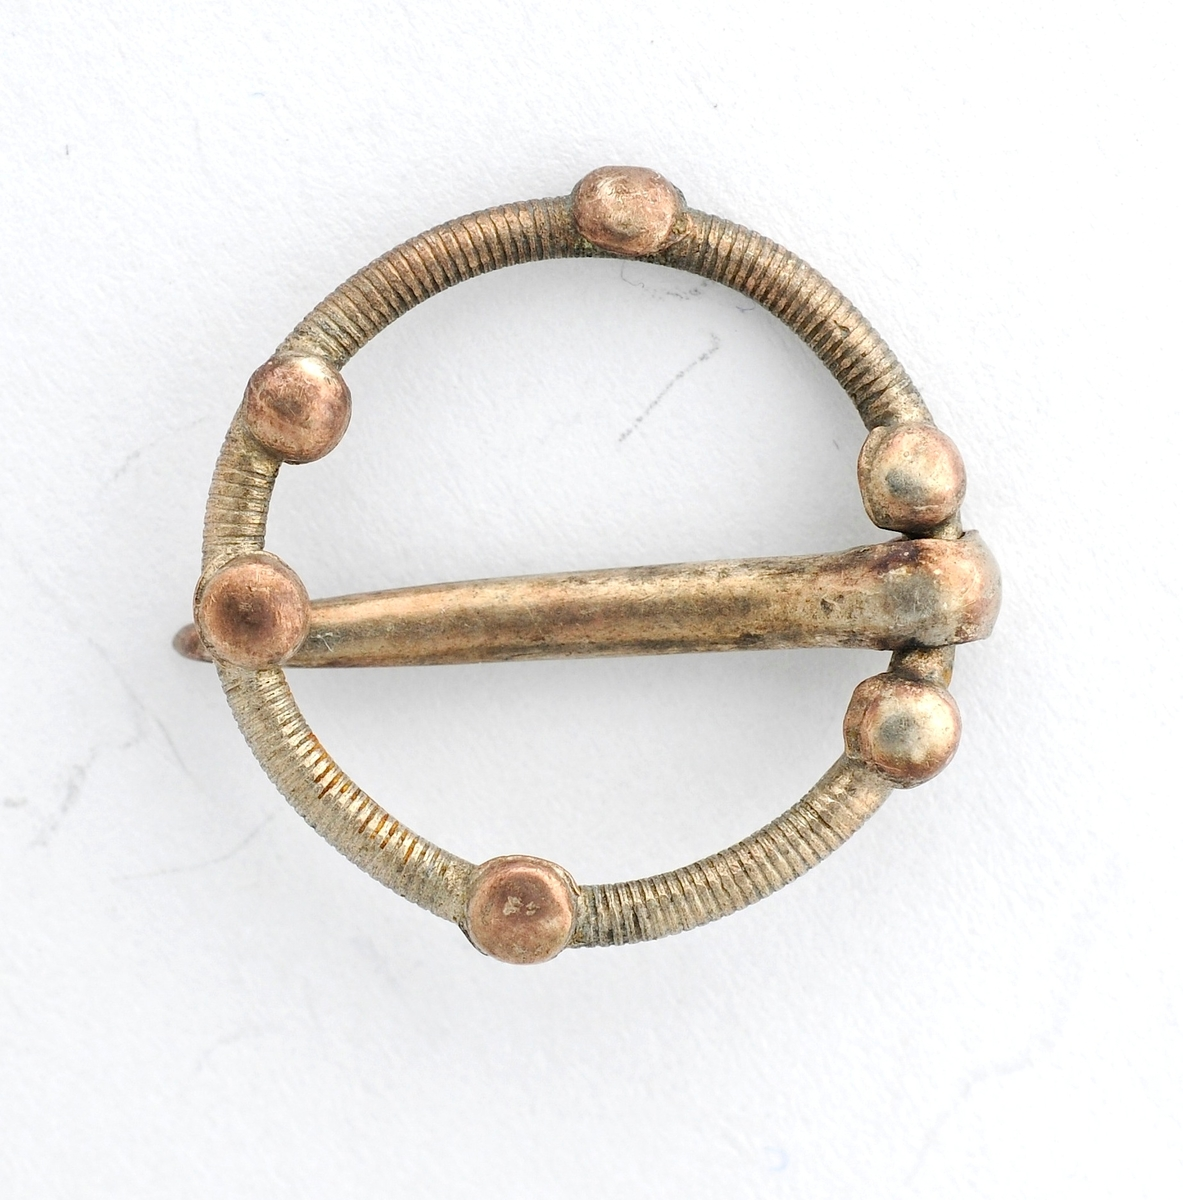 Sølje, sprette i sølv (manglar stempel). Smal, støypt ring med pålodda seks små, runde, plater. Laus tann.